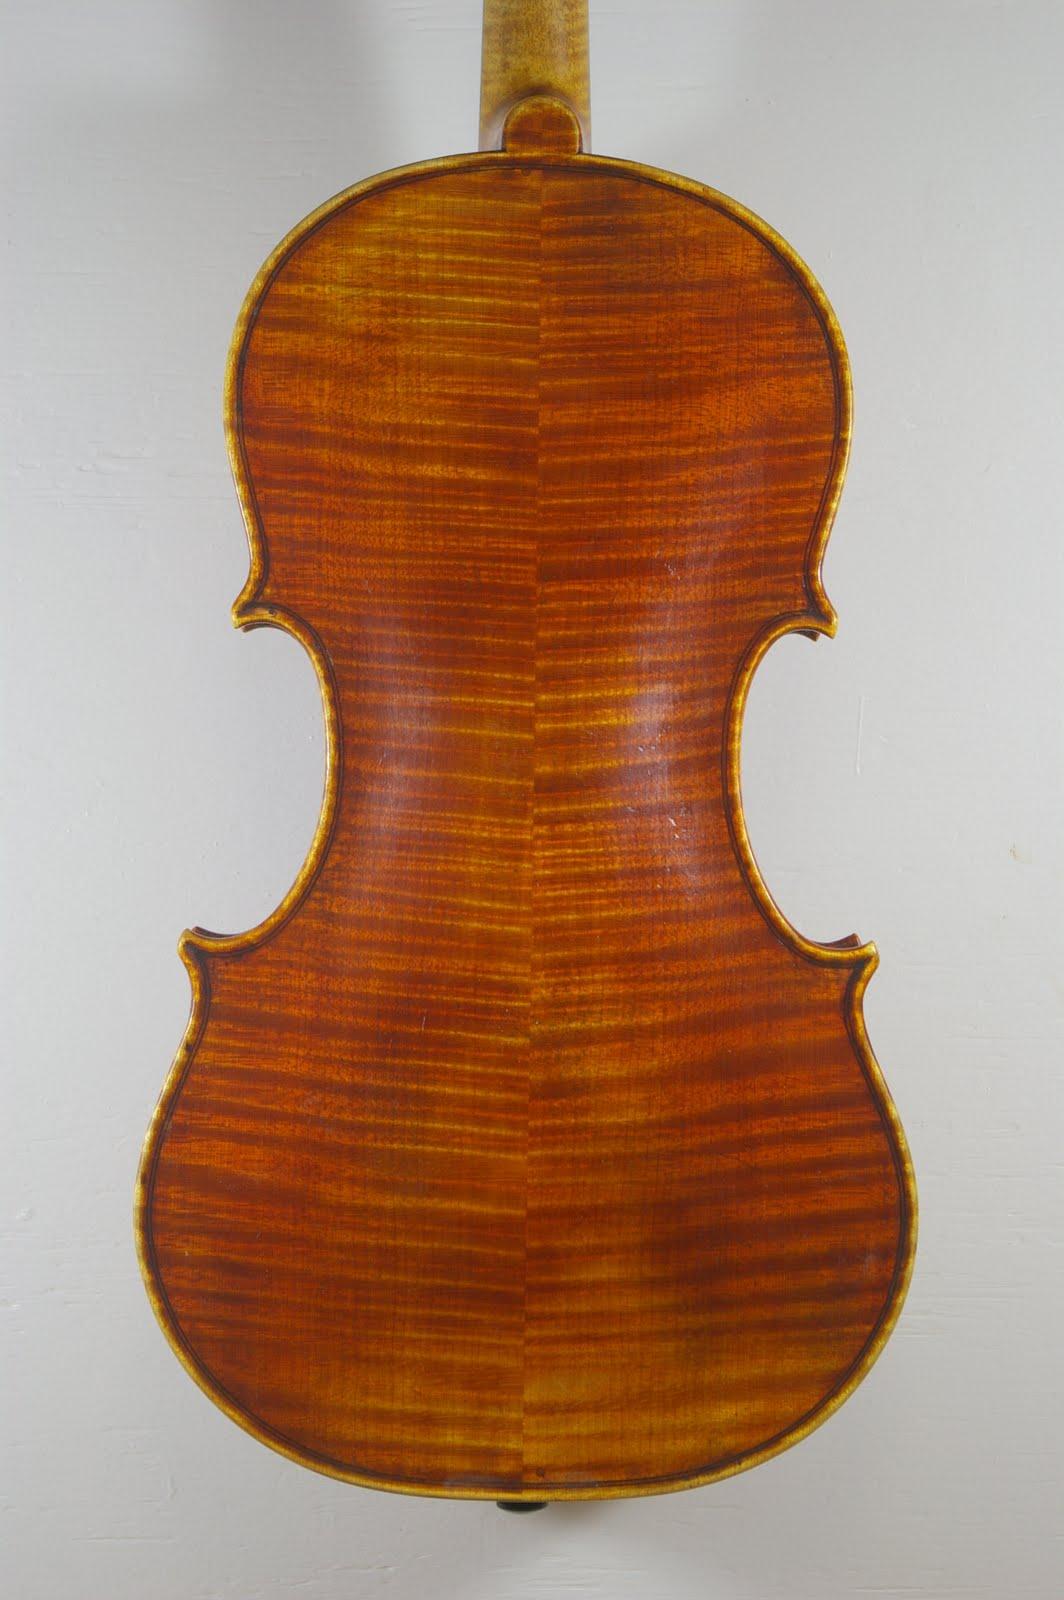 v592011-21